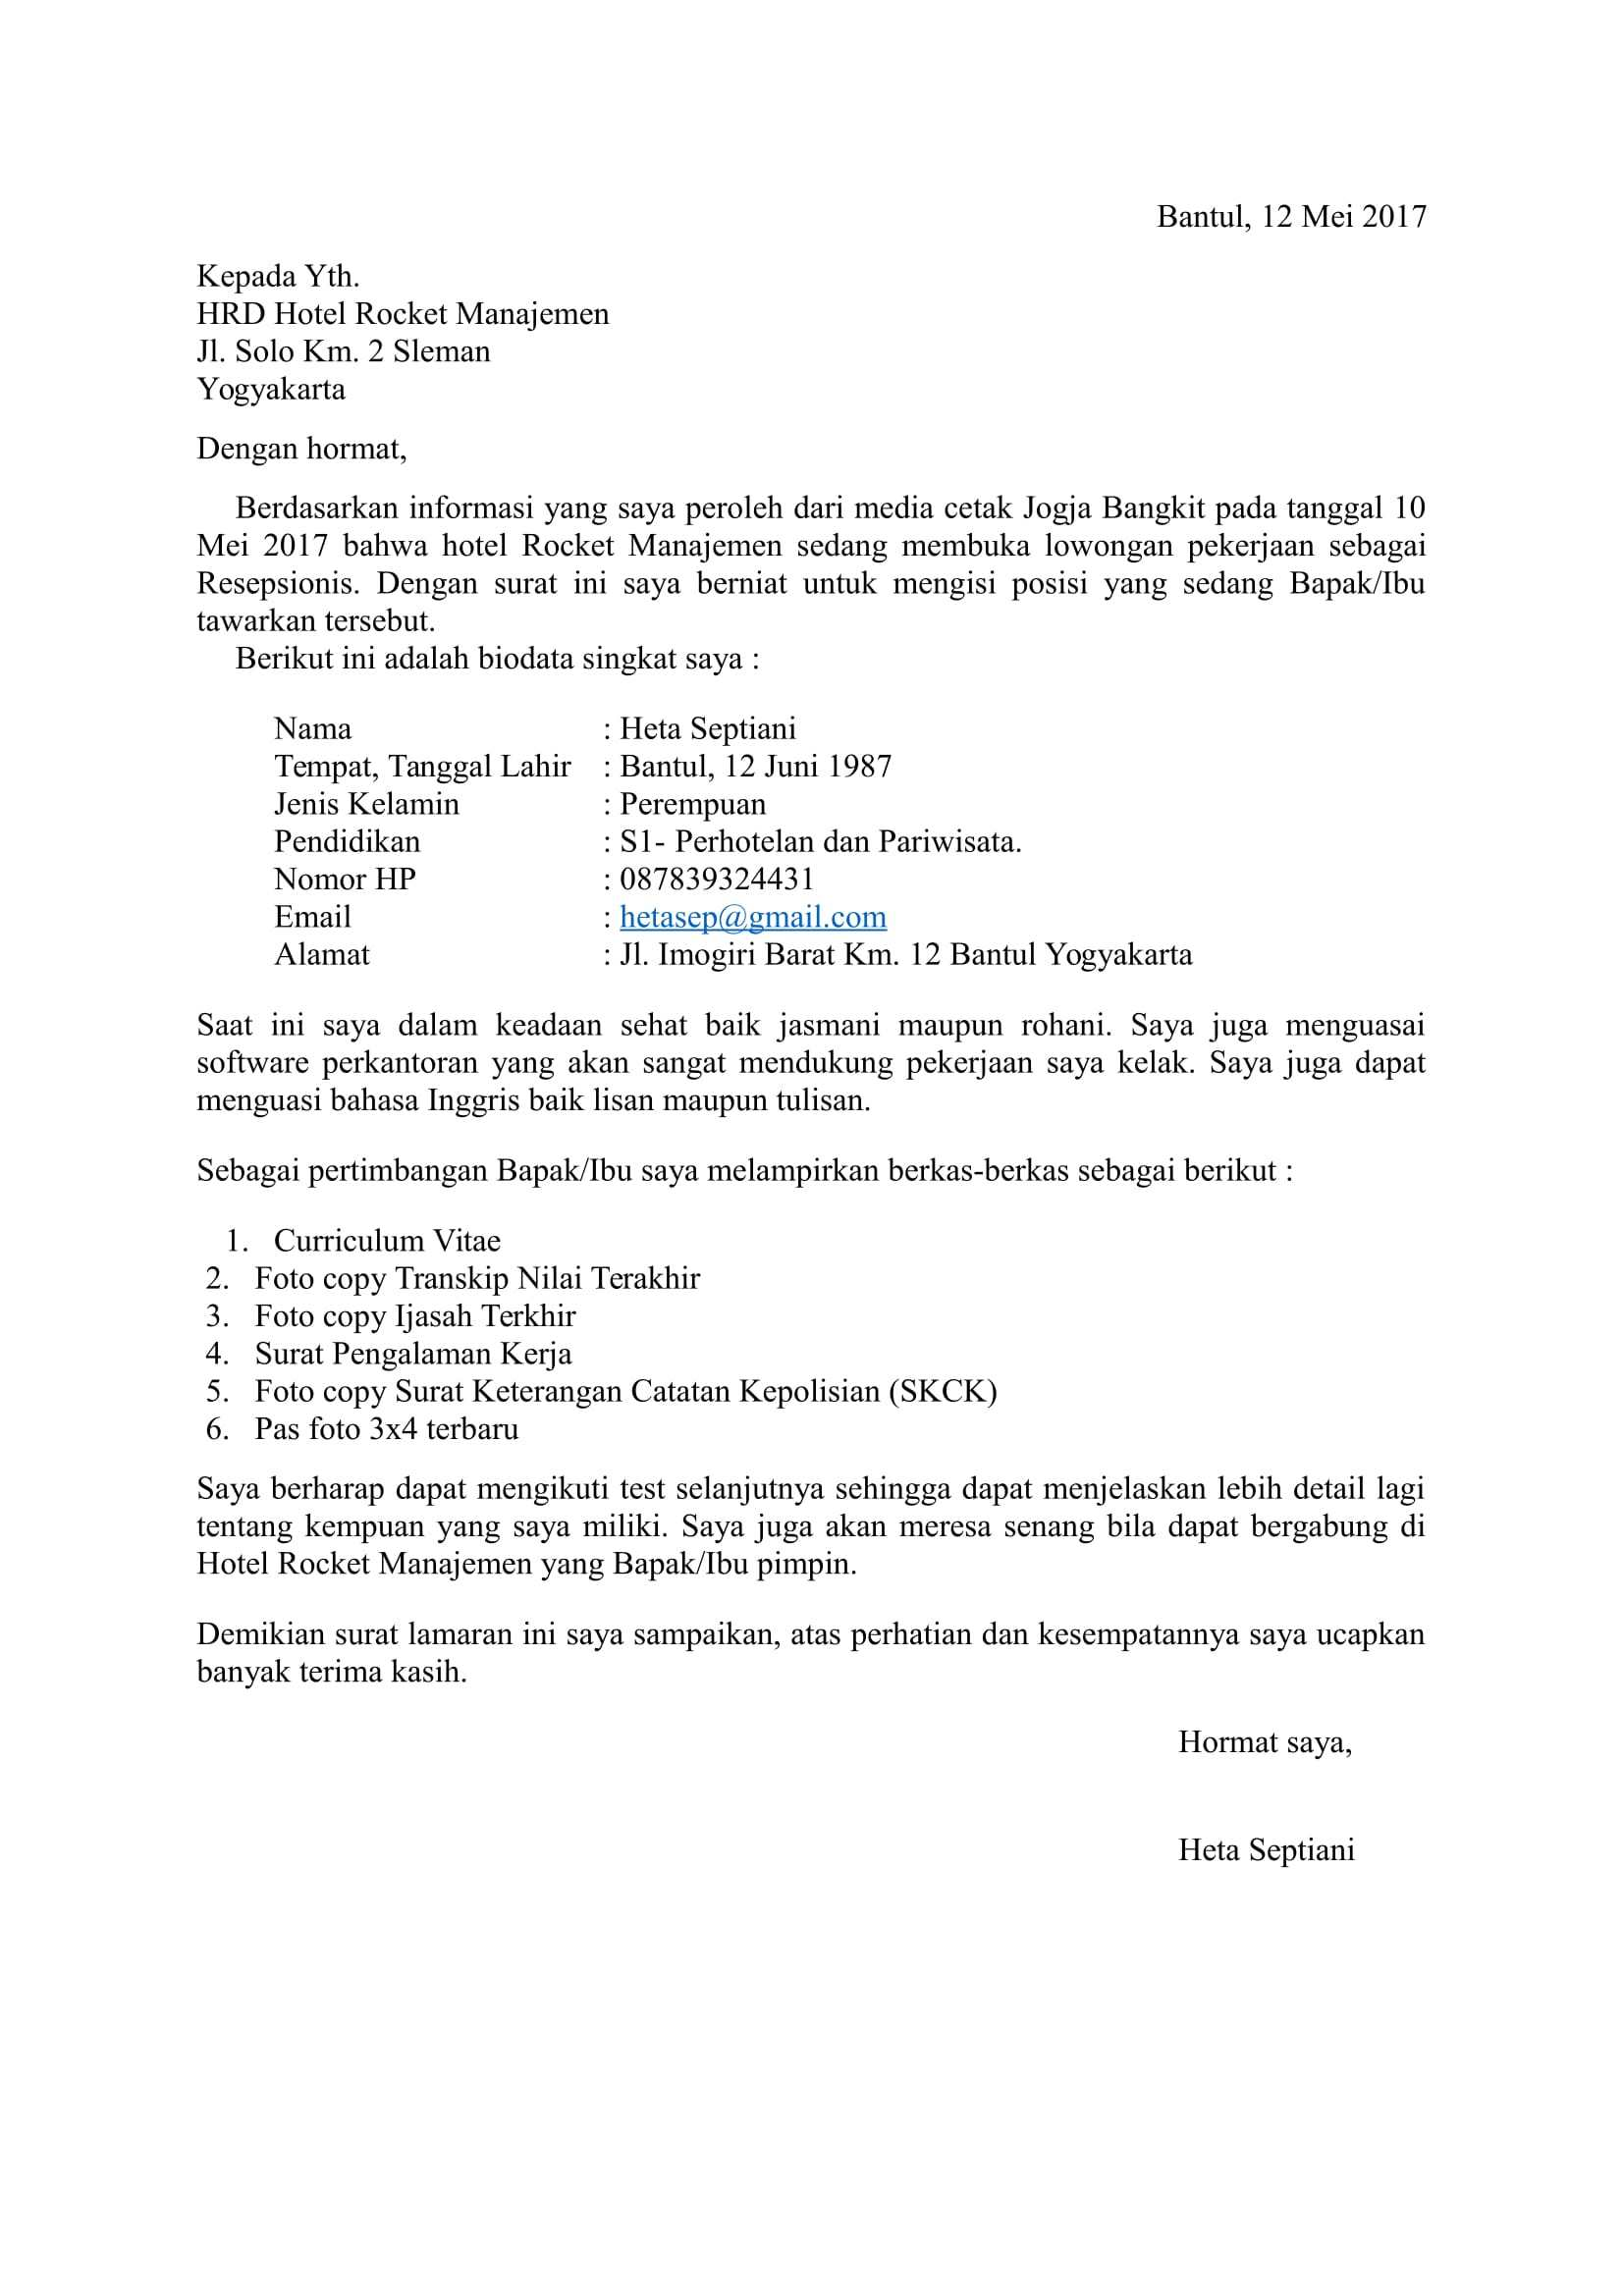 Contoh Lamaran Kerja Hotel Via Email